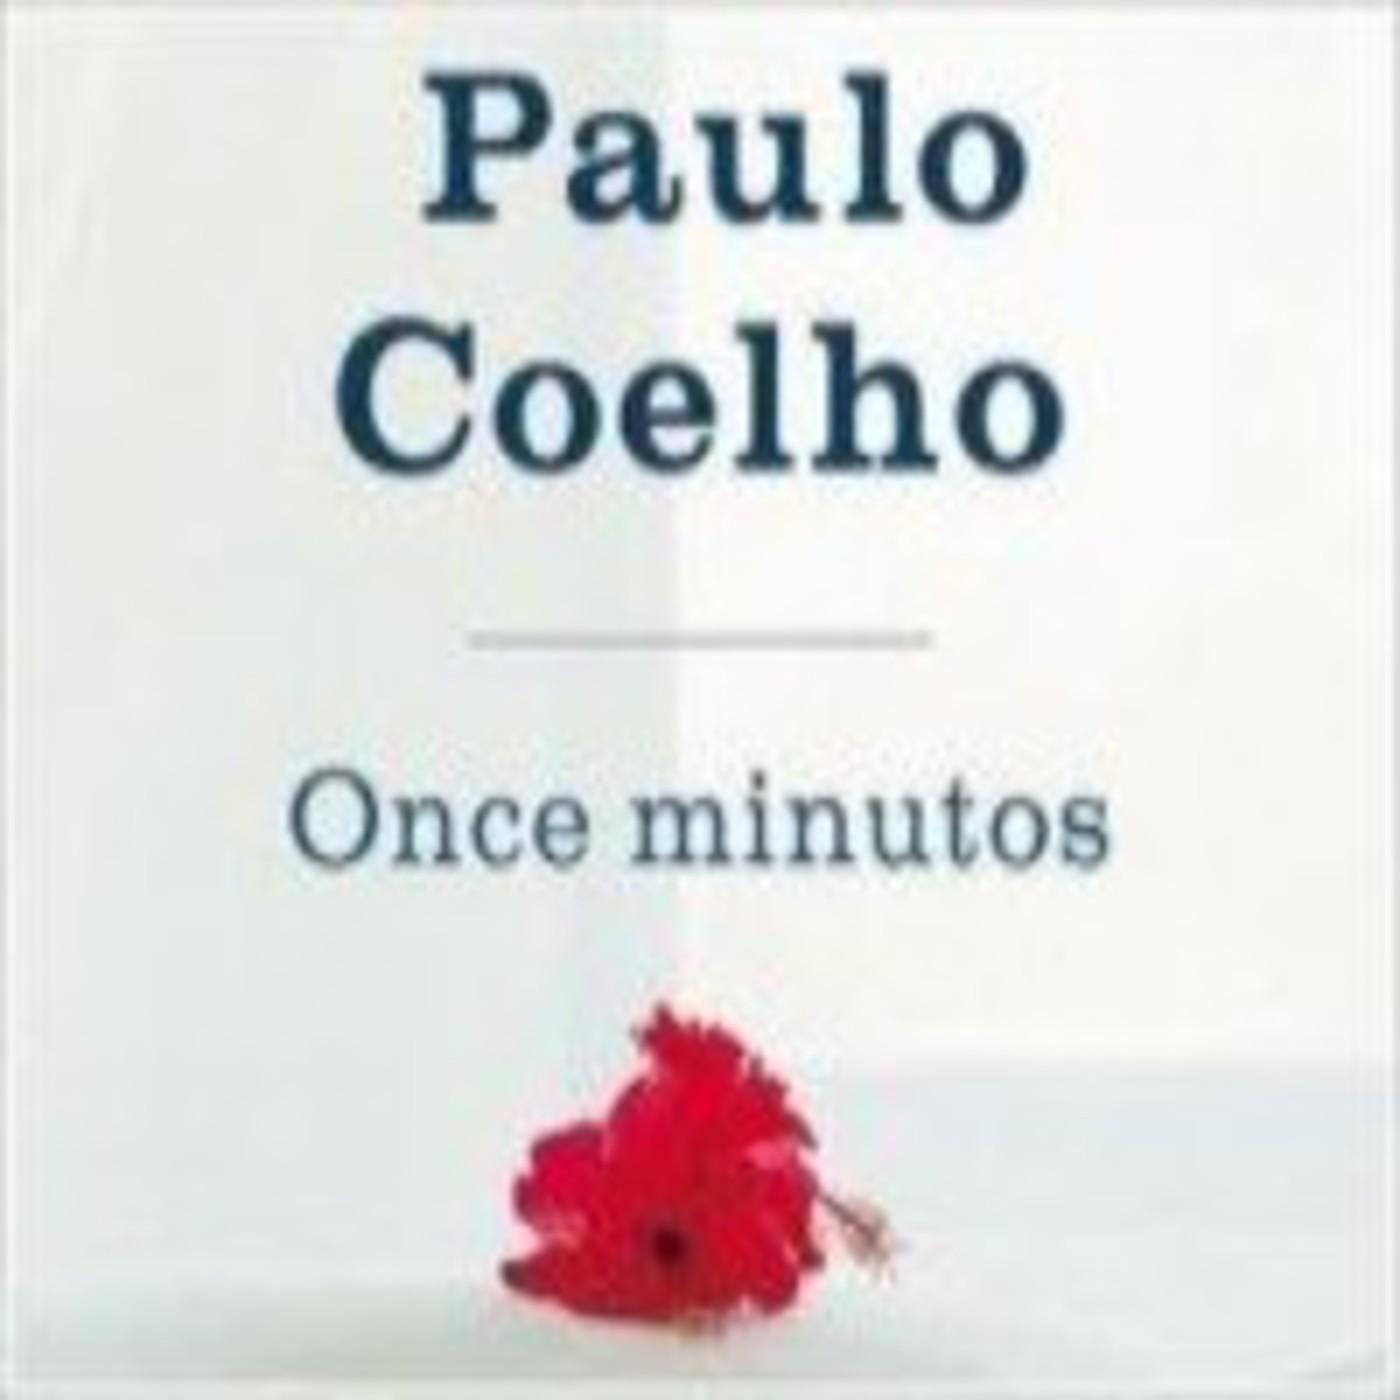 audiolibros paulo coelho once minutos